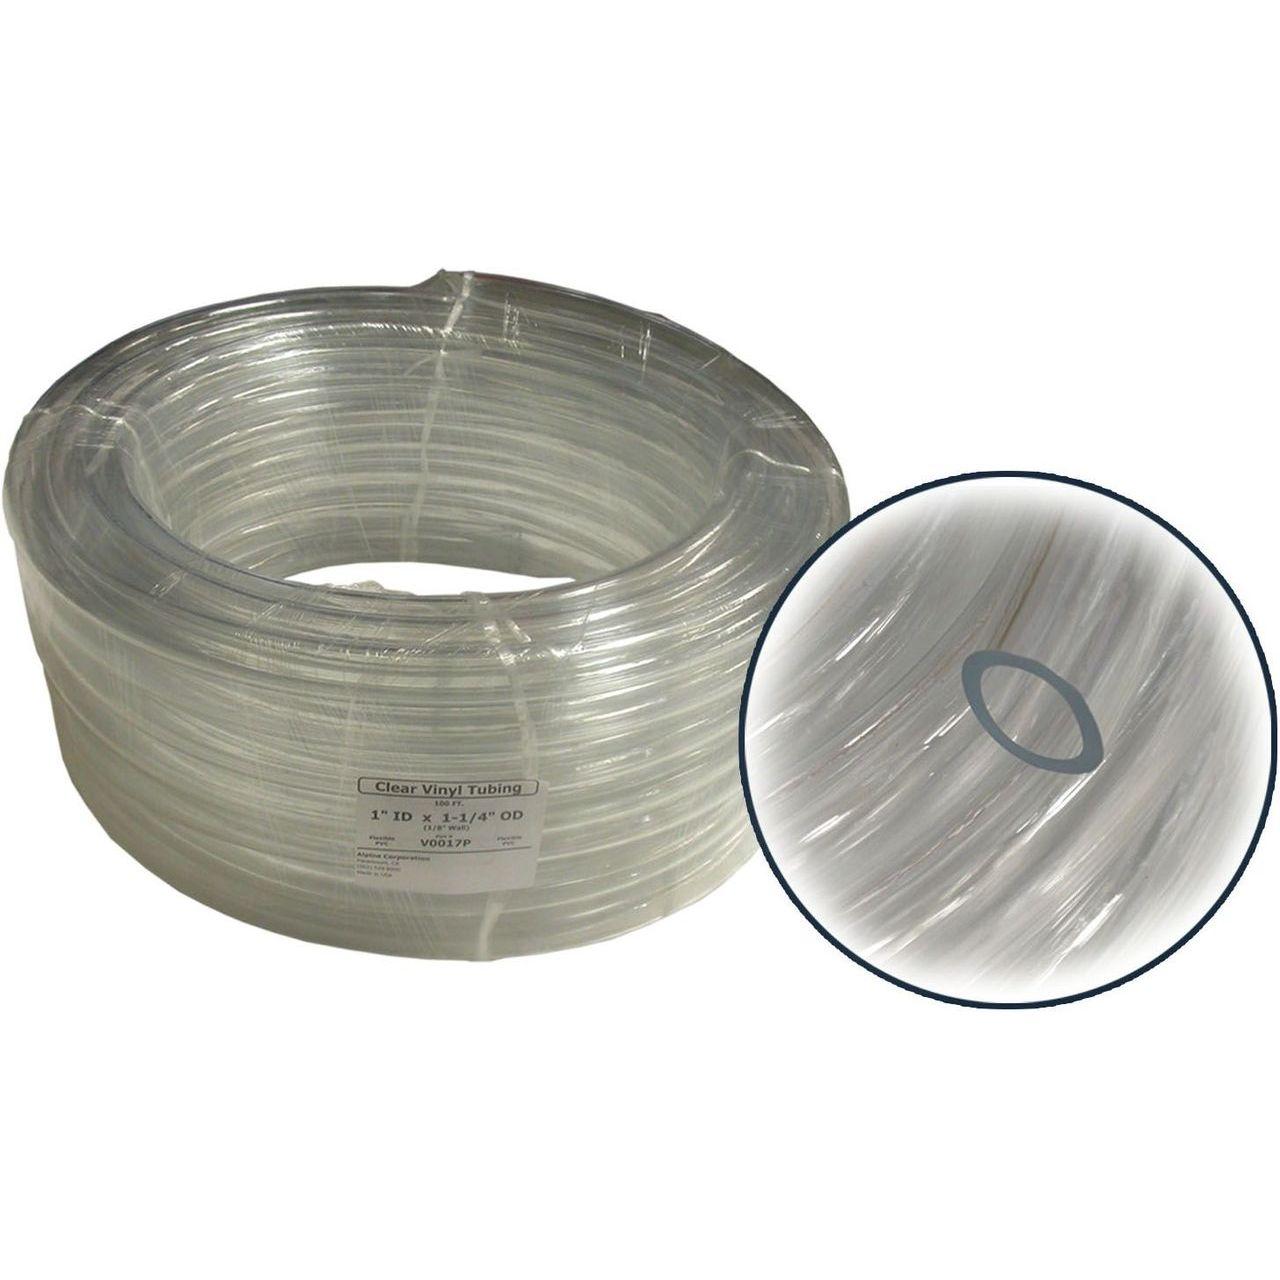 Alpine V0123P PVC Tubing - 1/2'' ID x 5/8'' OD Wall x 100' Coil